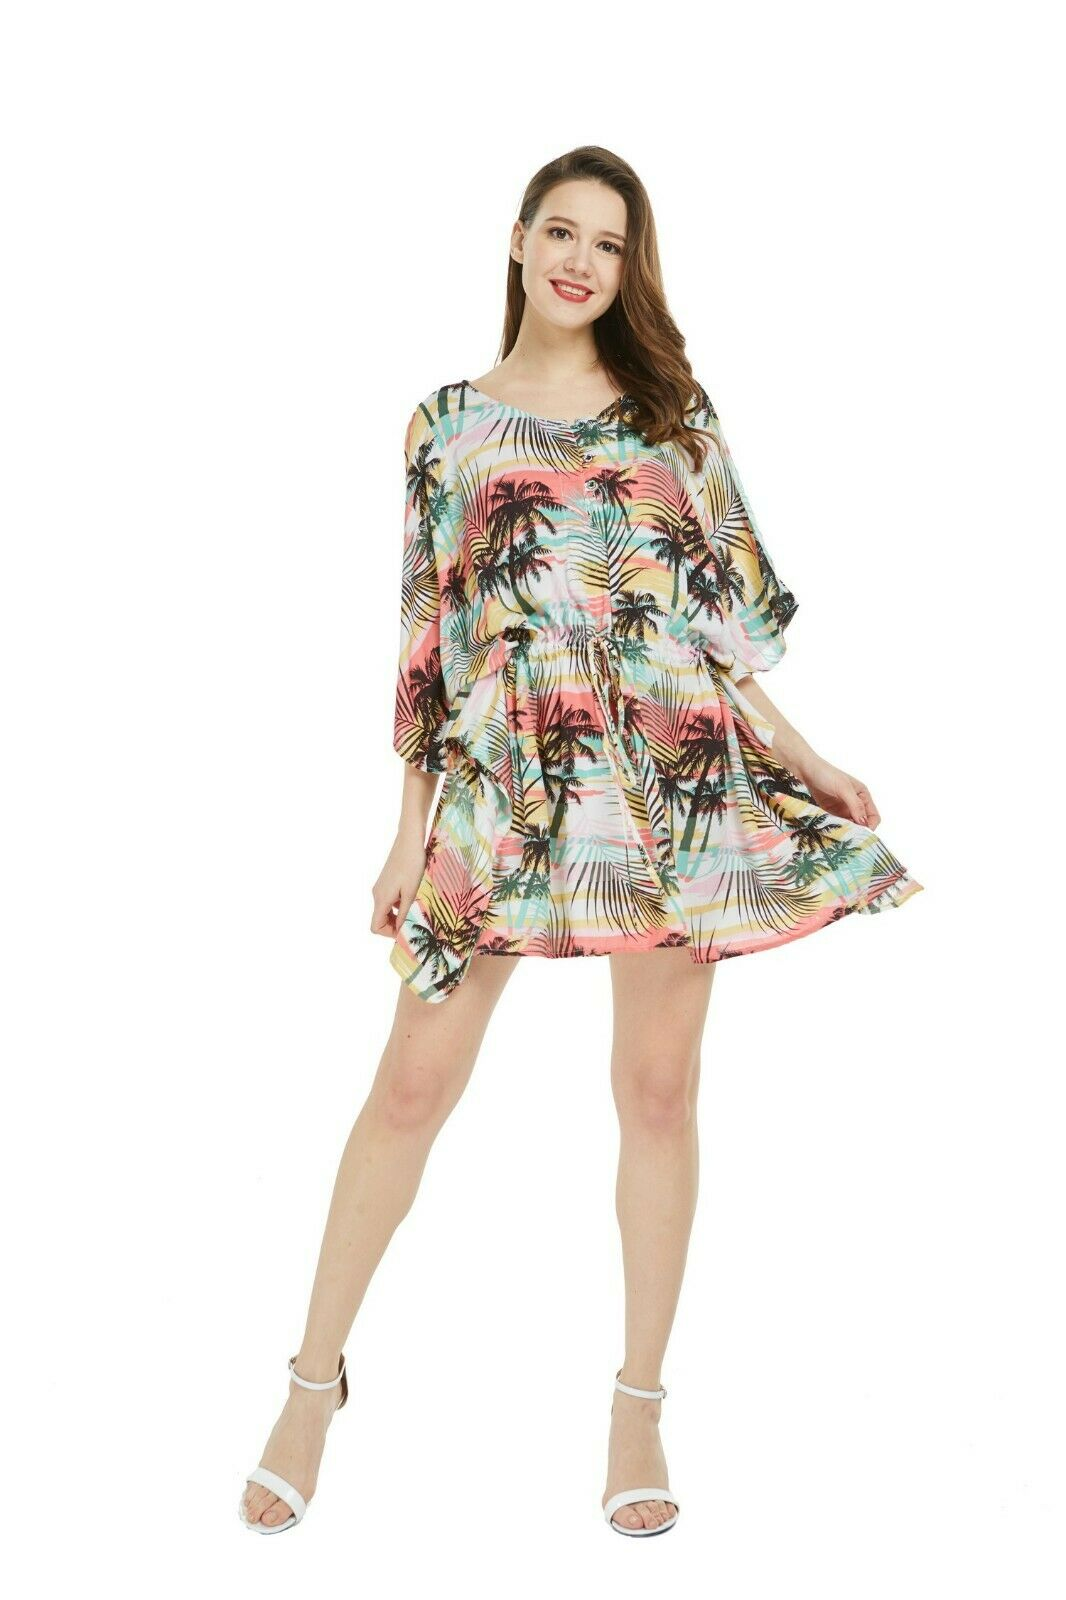 0b51eba48dce Hawaii Hangover Women Poncho Dress Luau Cruise One Size in Sunset ...